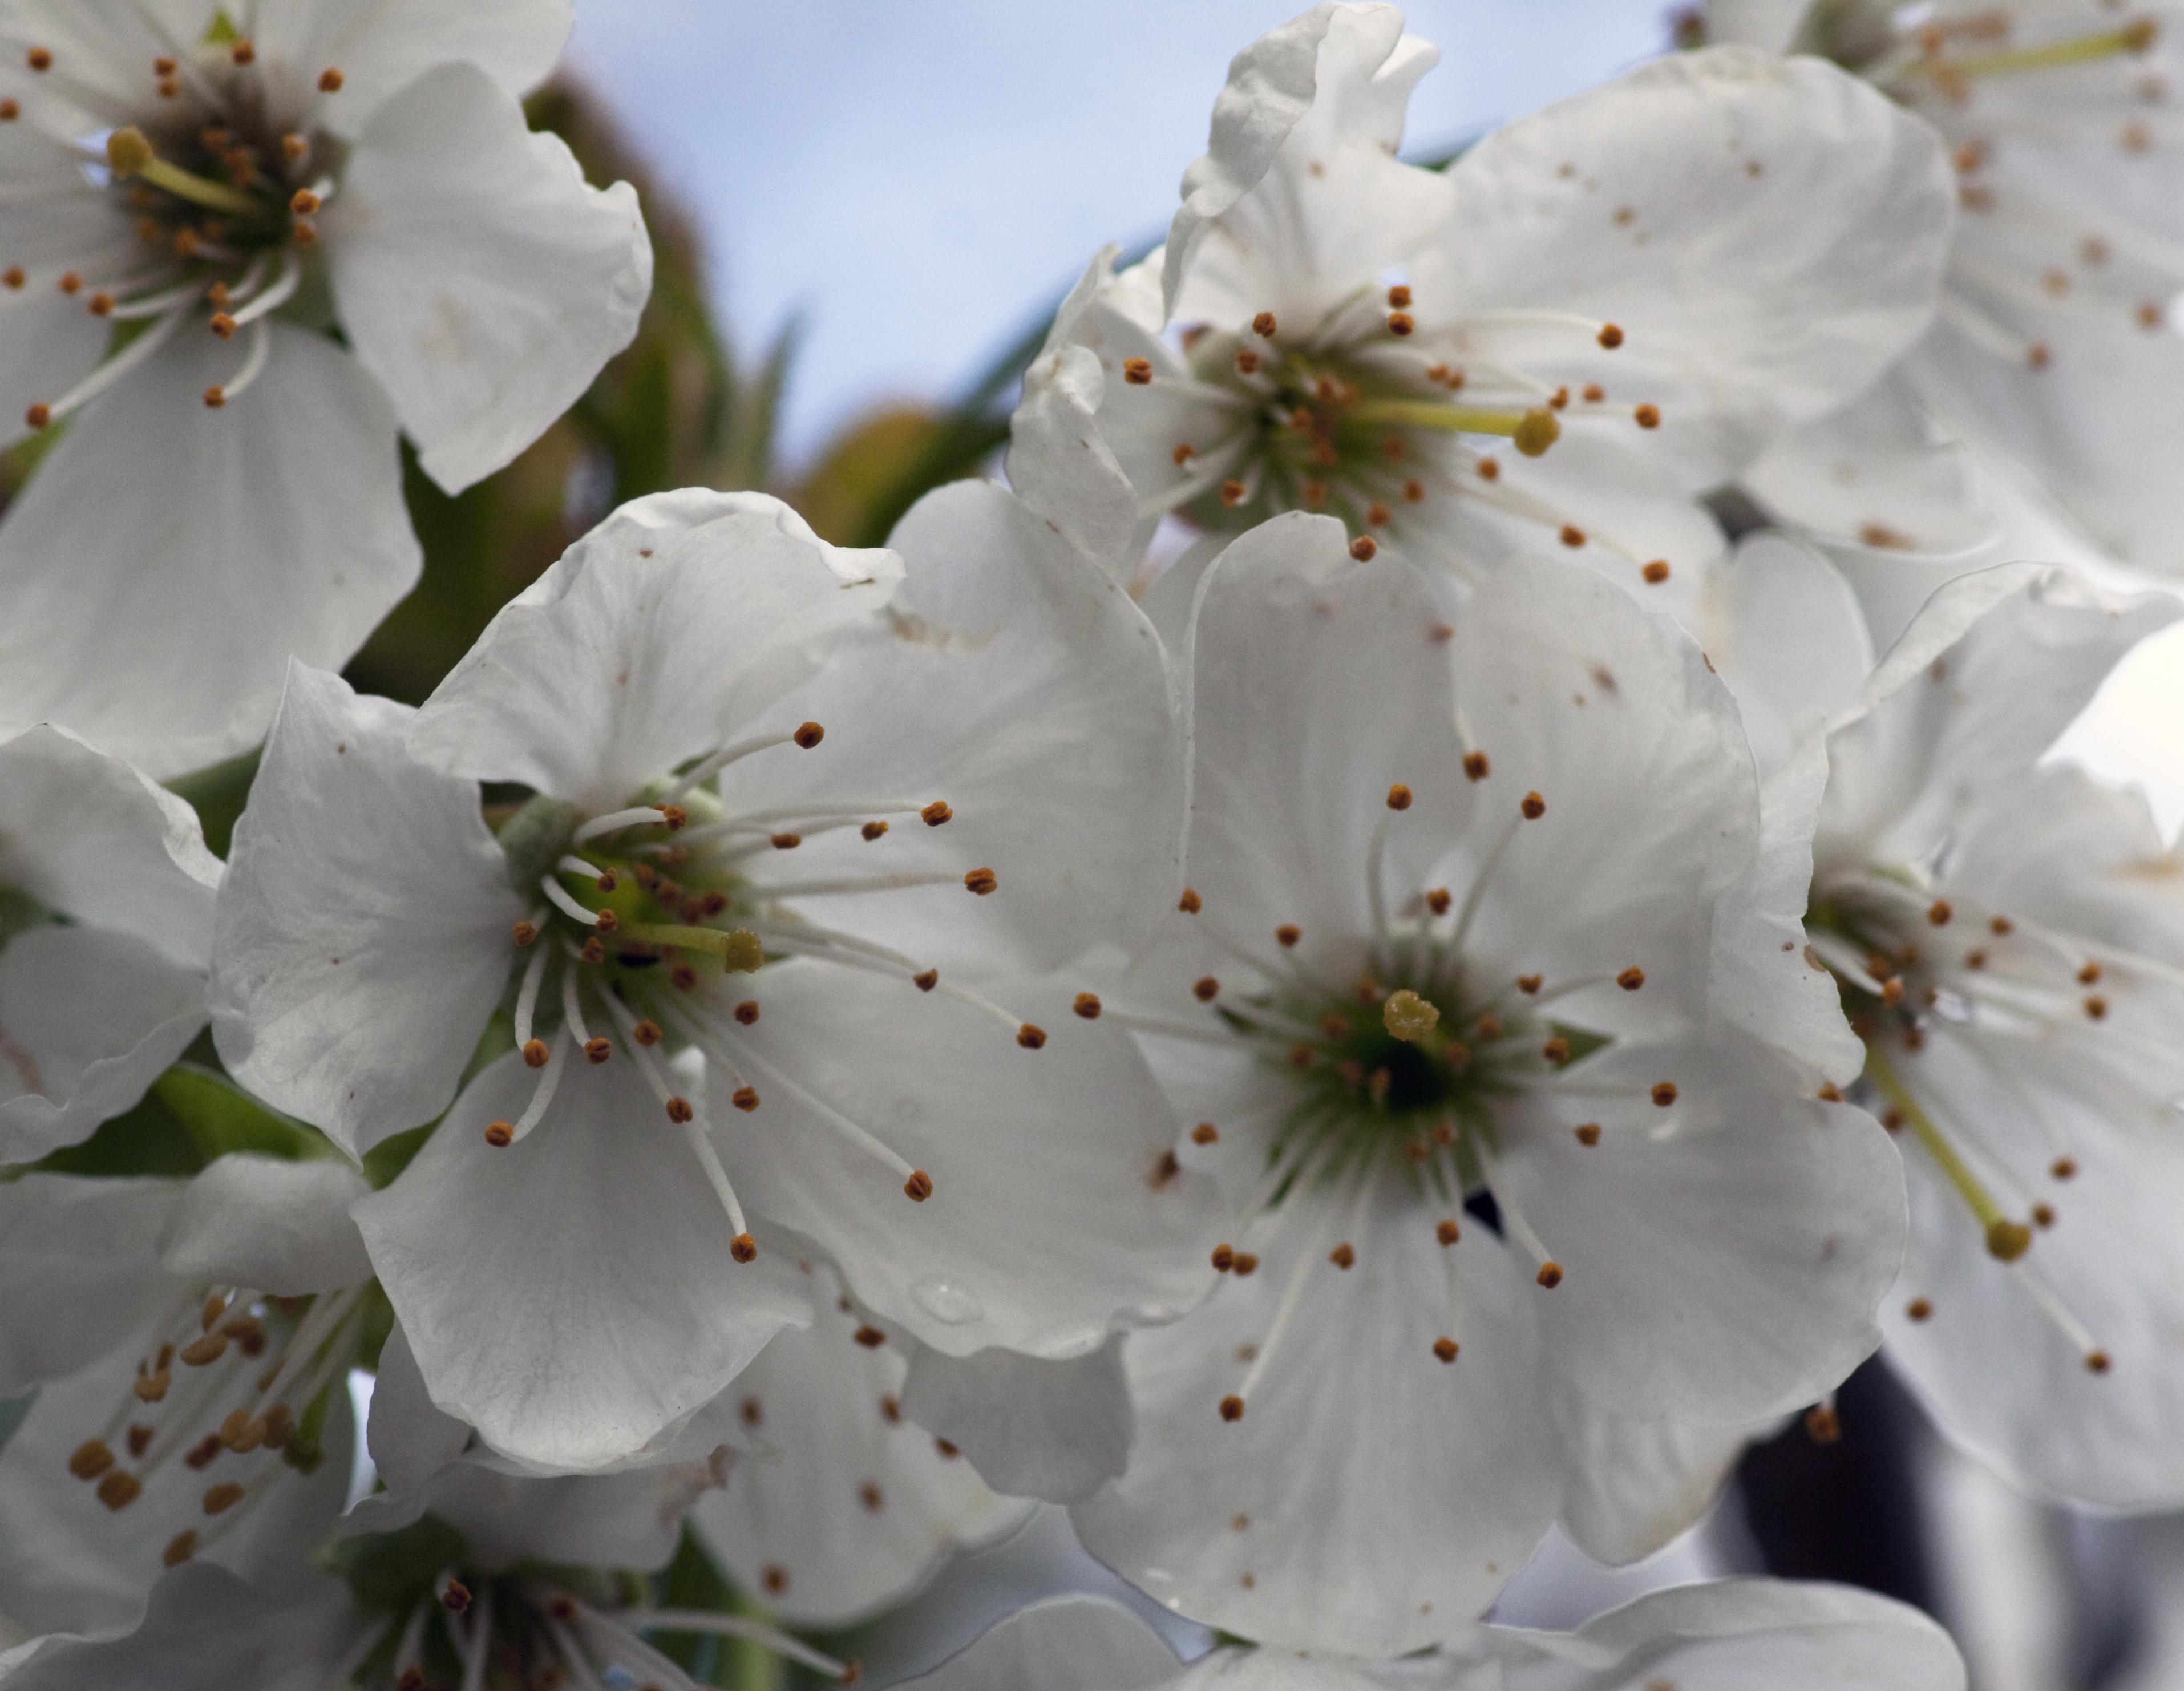 File:White Cherry Blossom (4551208506).jpg - Wikimedia Commons